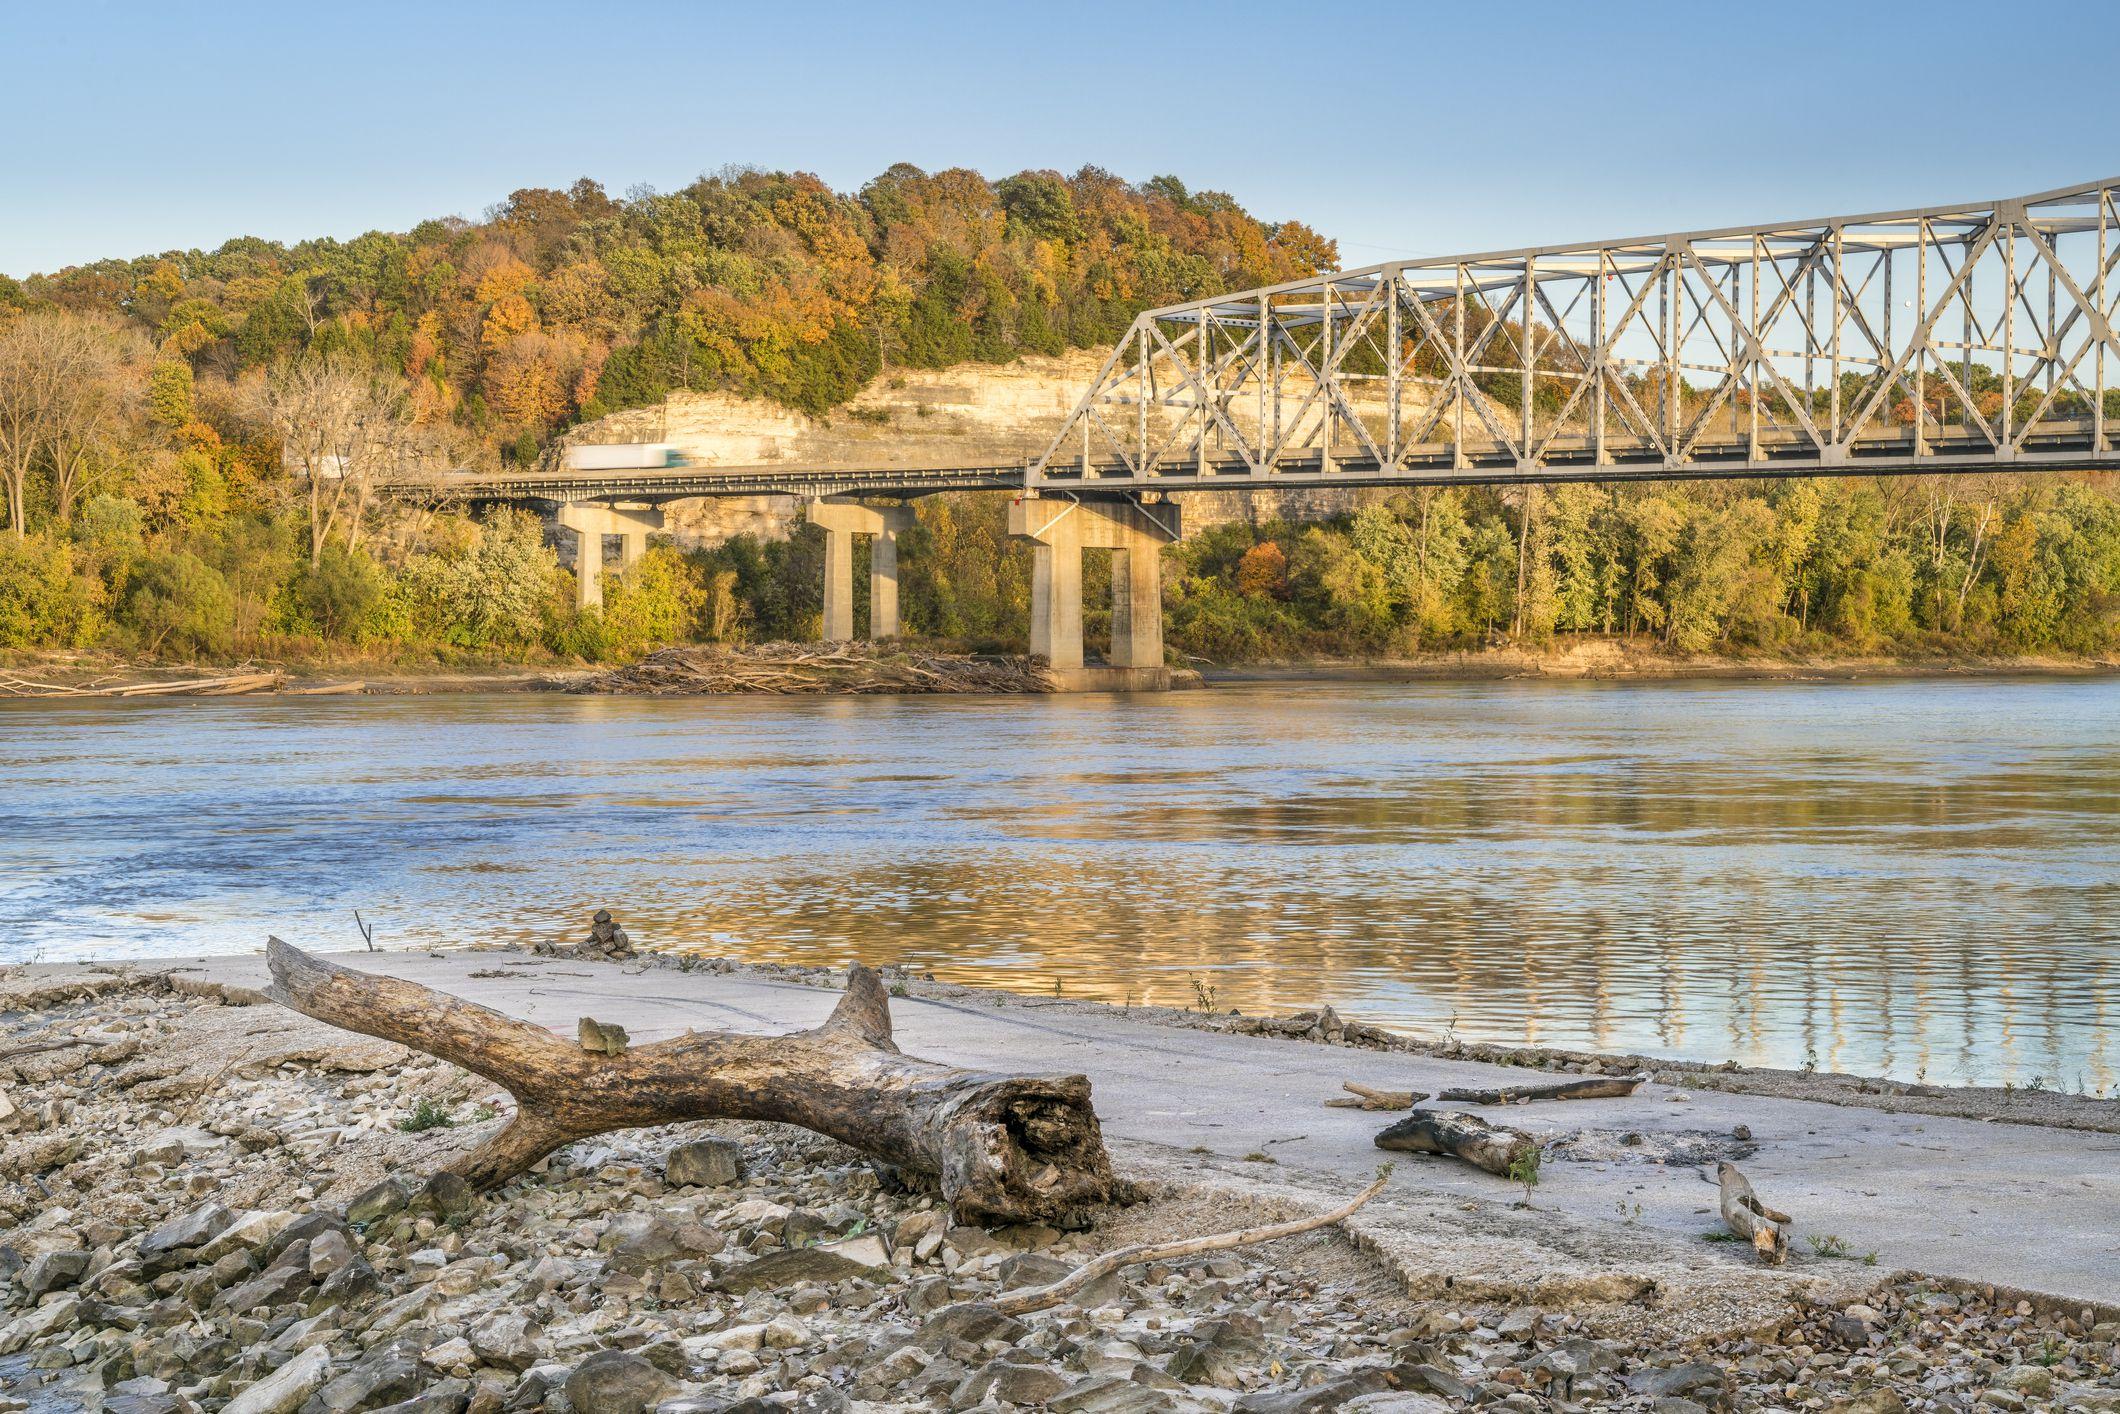 Missouri River at Taylor's Landing near Rocheport, MO